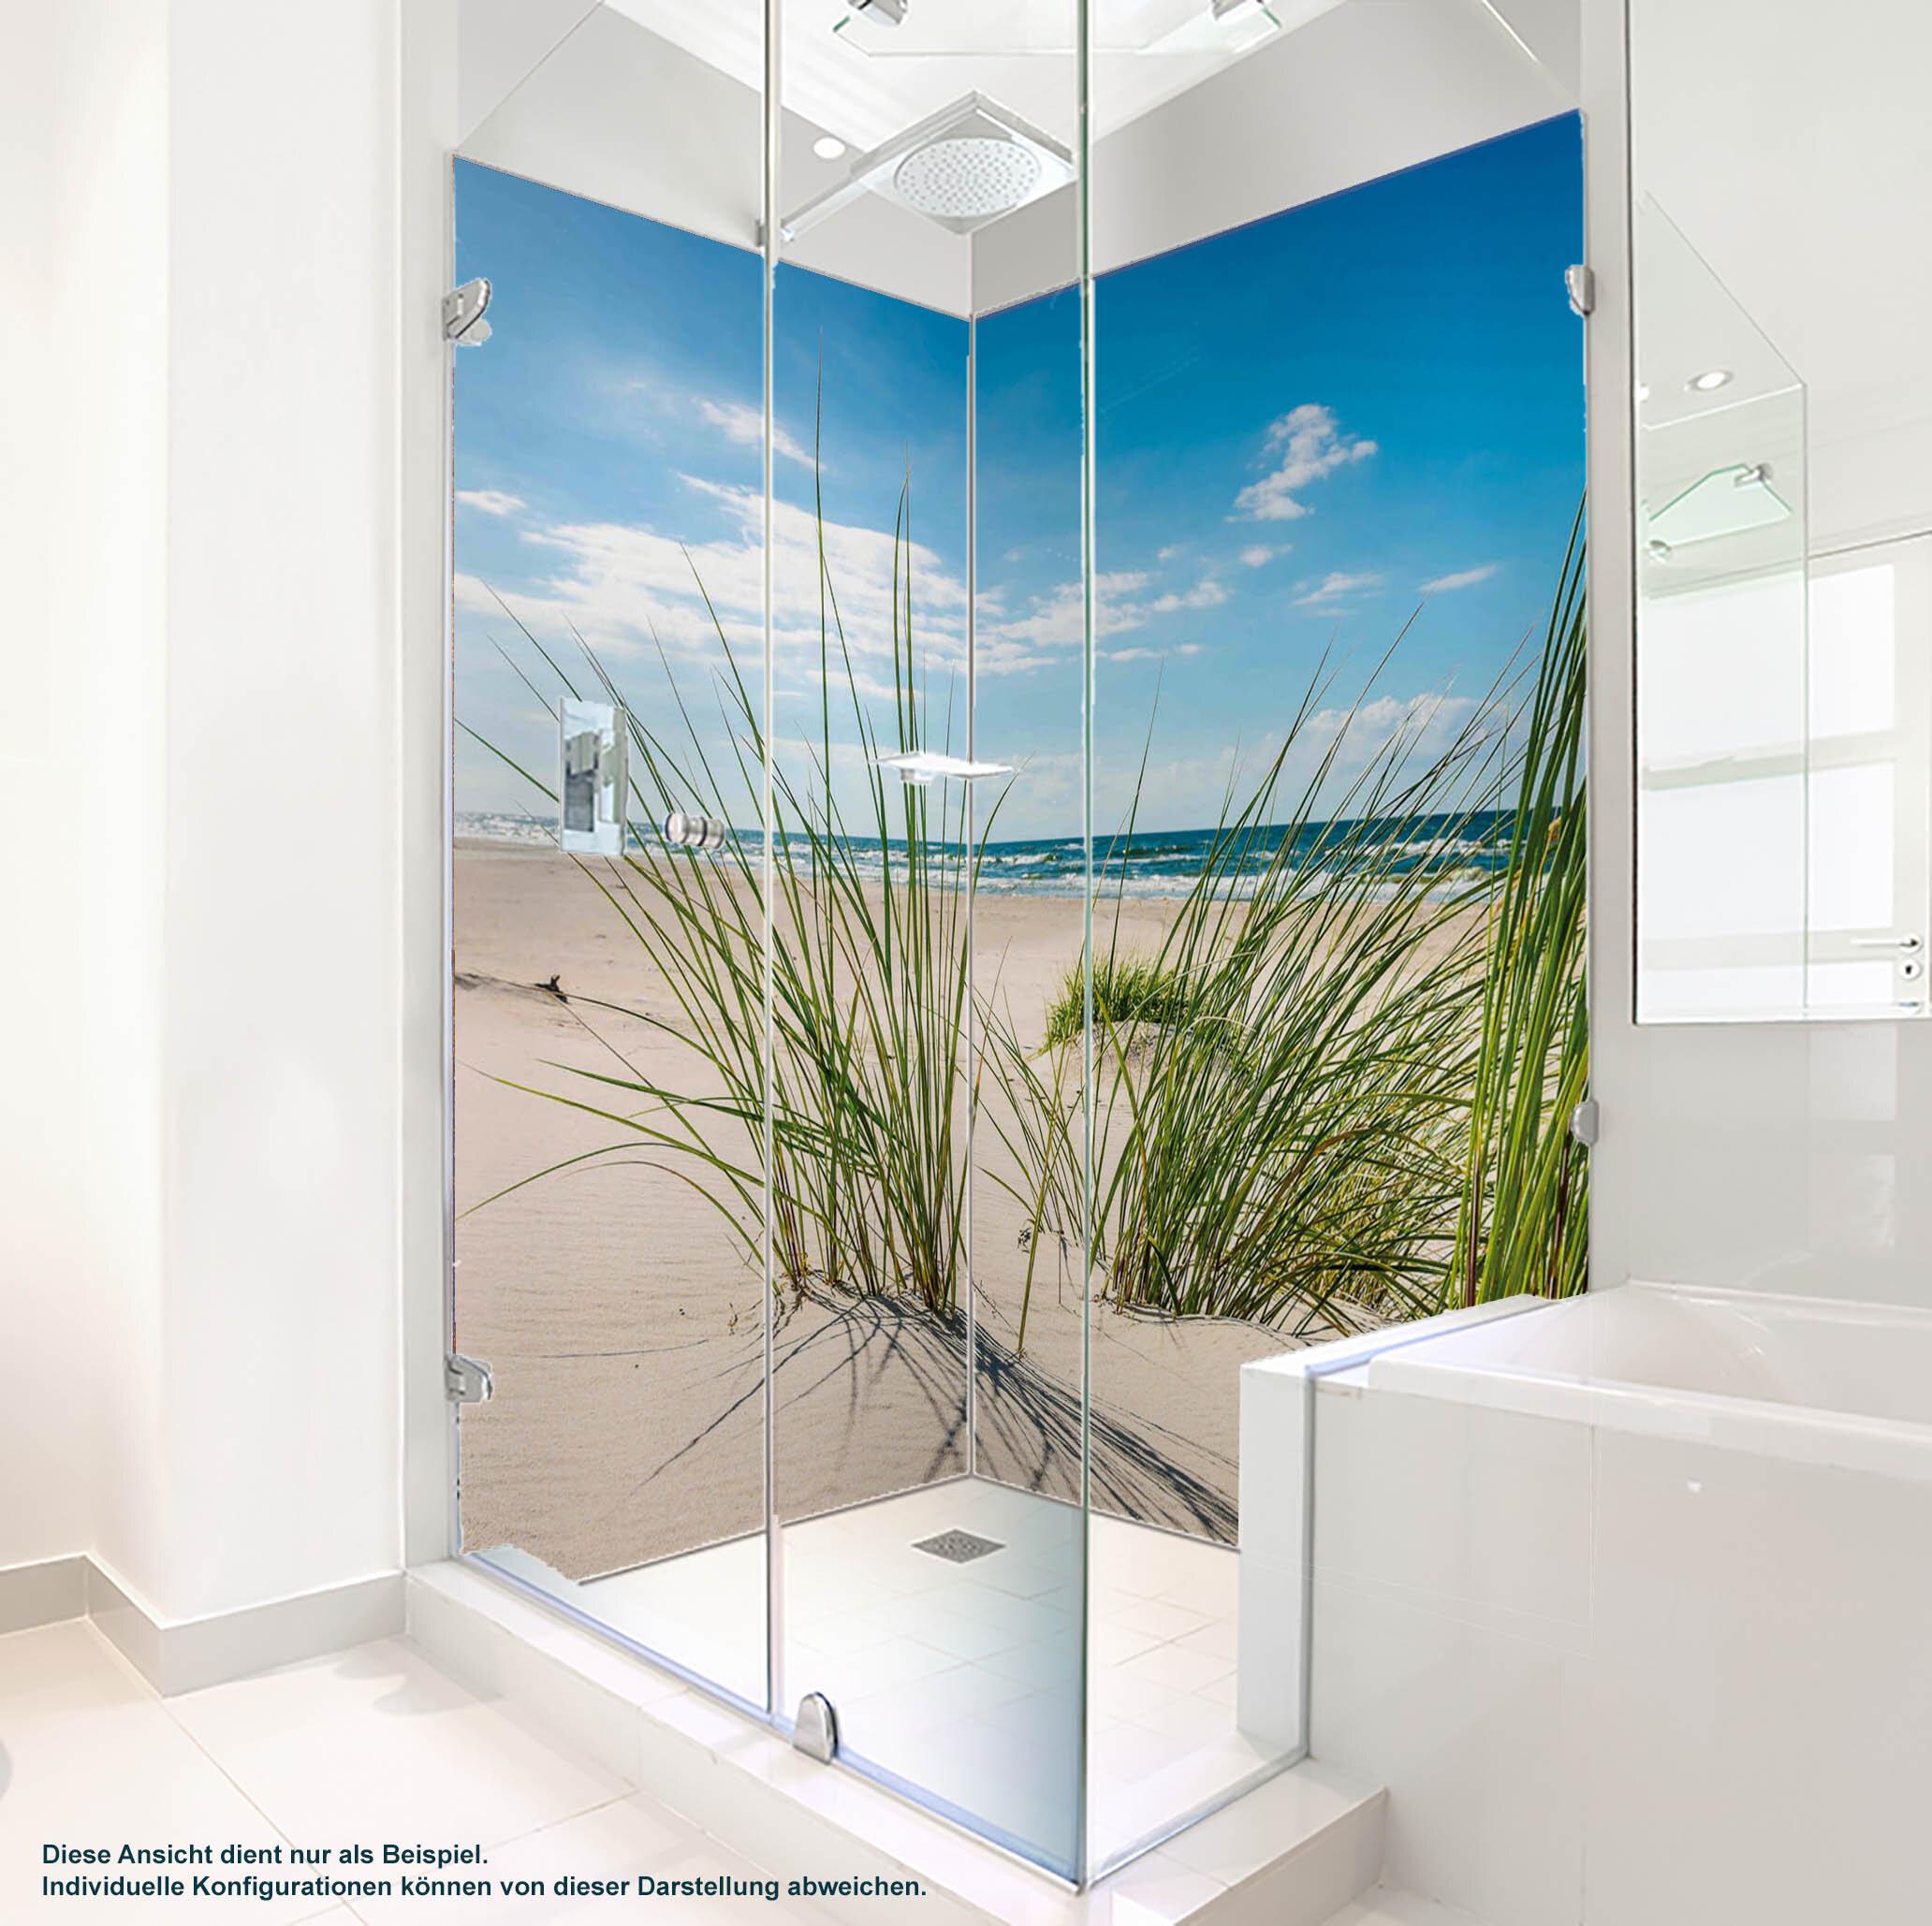 Dusche PlateART Duschrückwand mit Motiv Strand und Meer Strand Gras